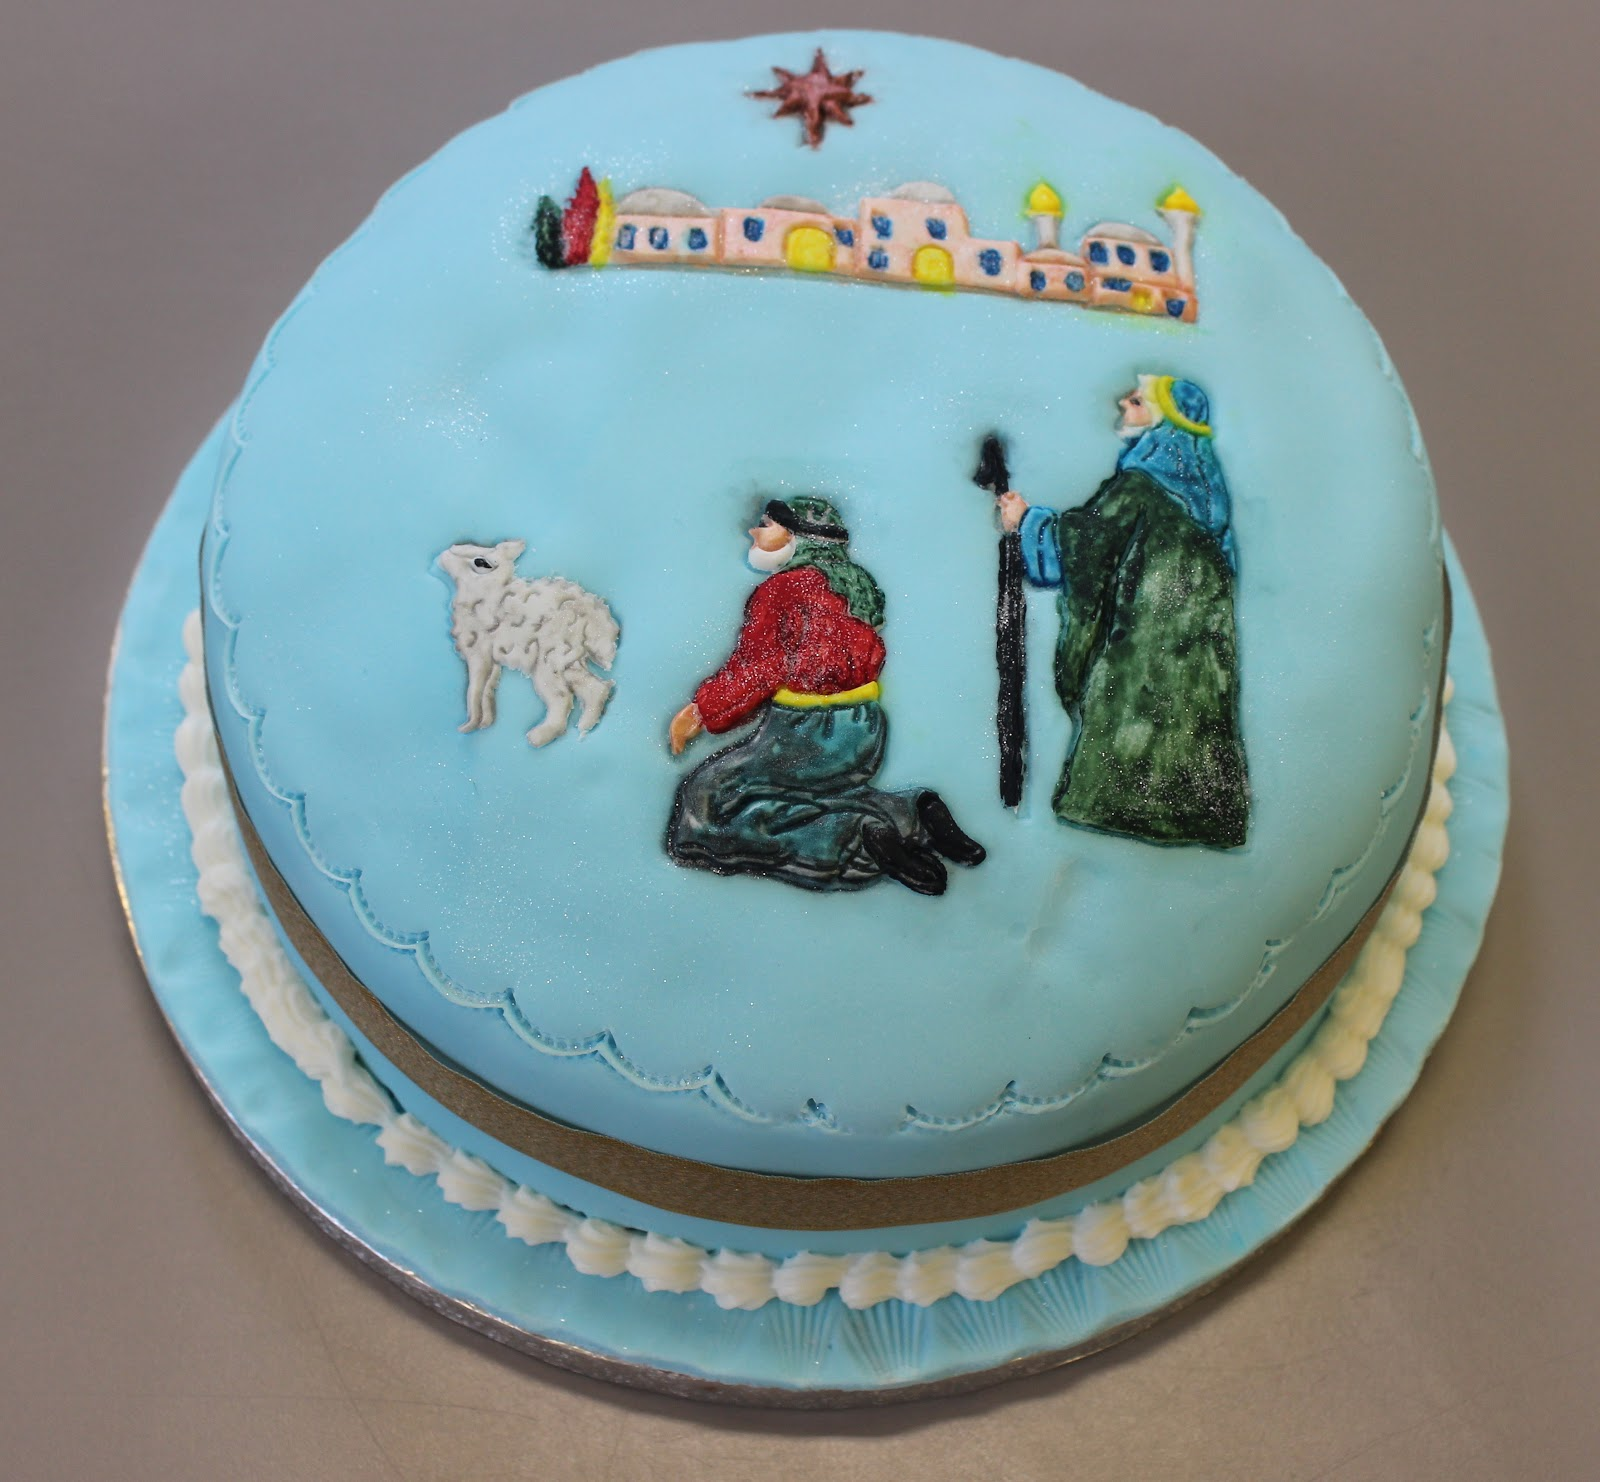 Flour Power Cake Journey: Basic cake decorating with a ...